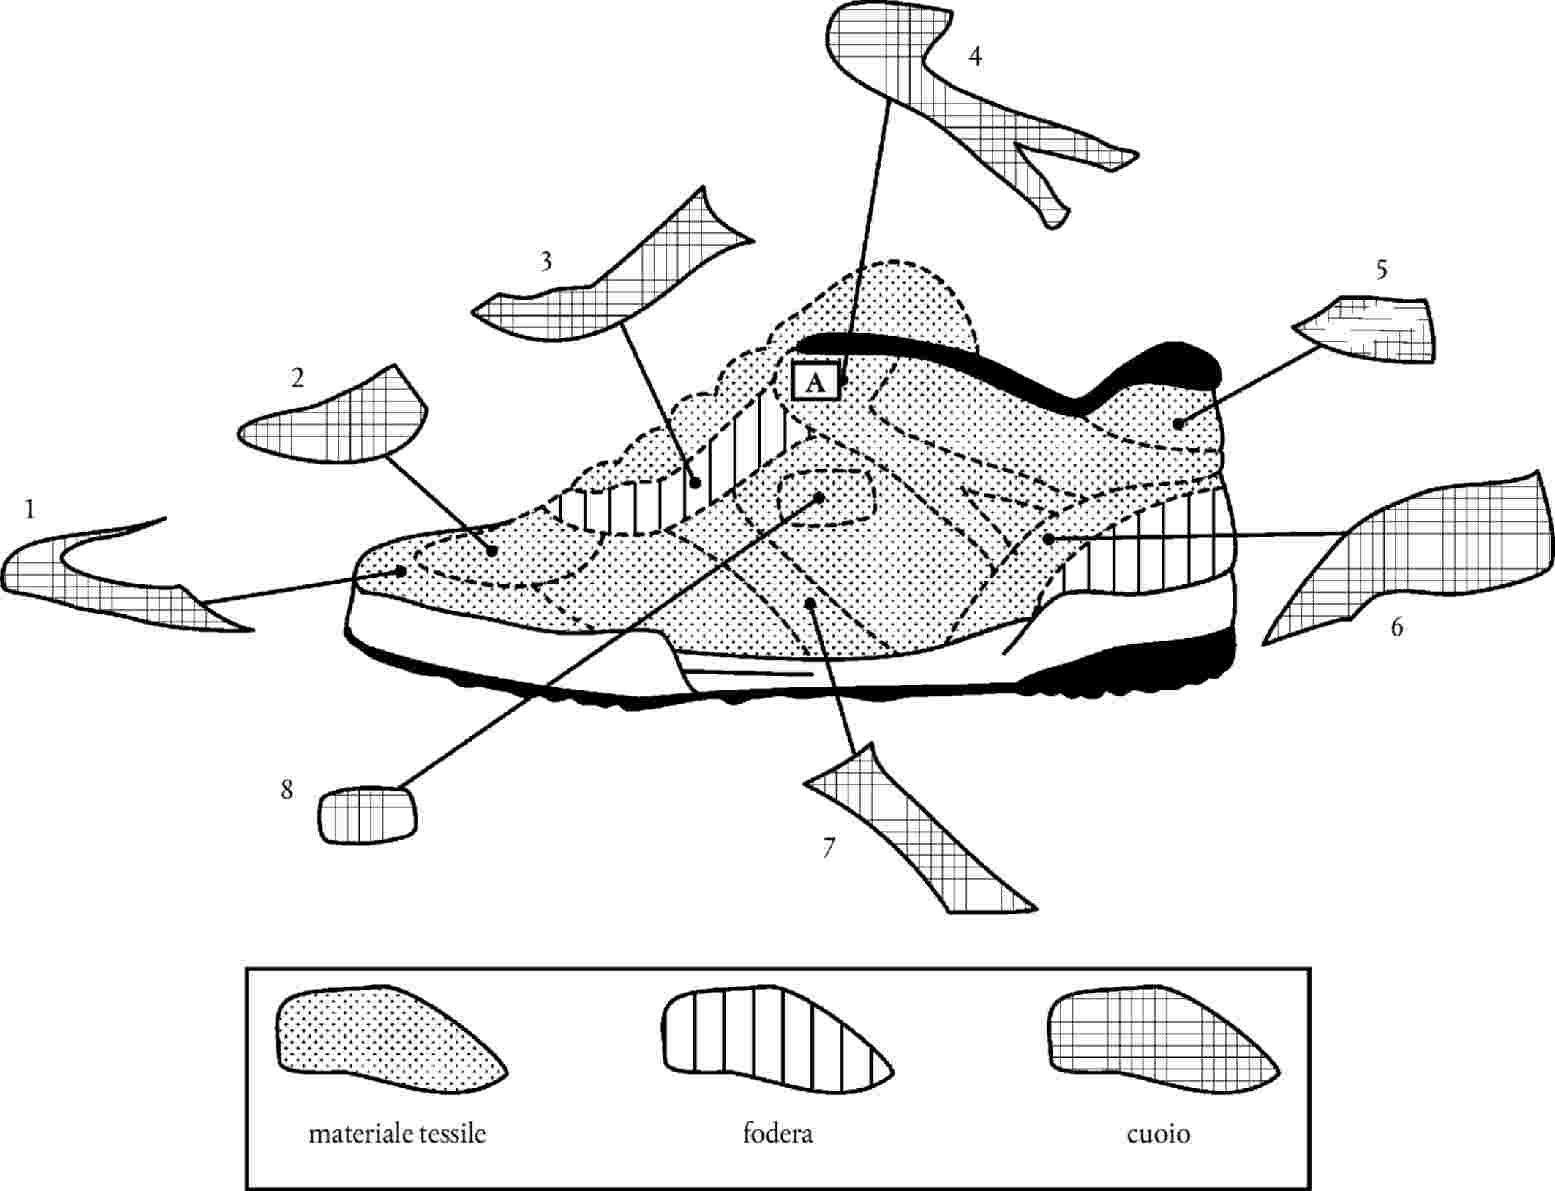 Footwear mould hs code